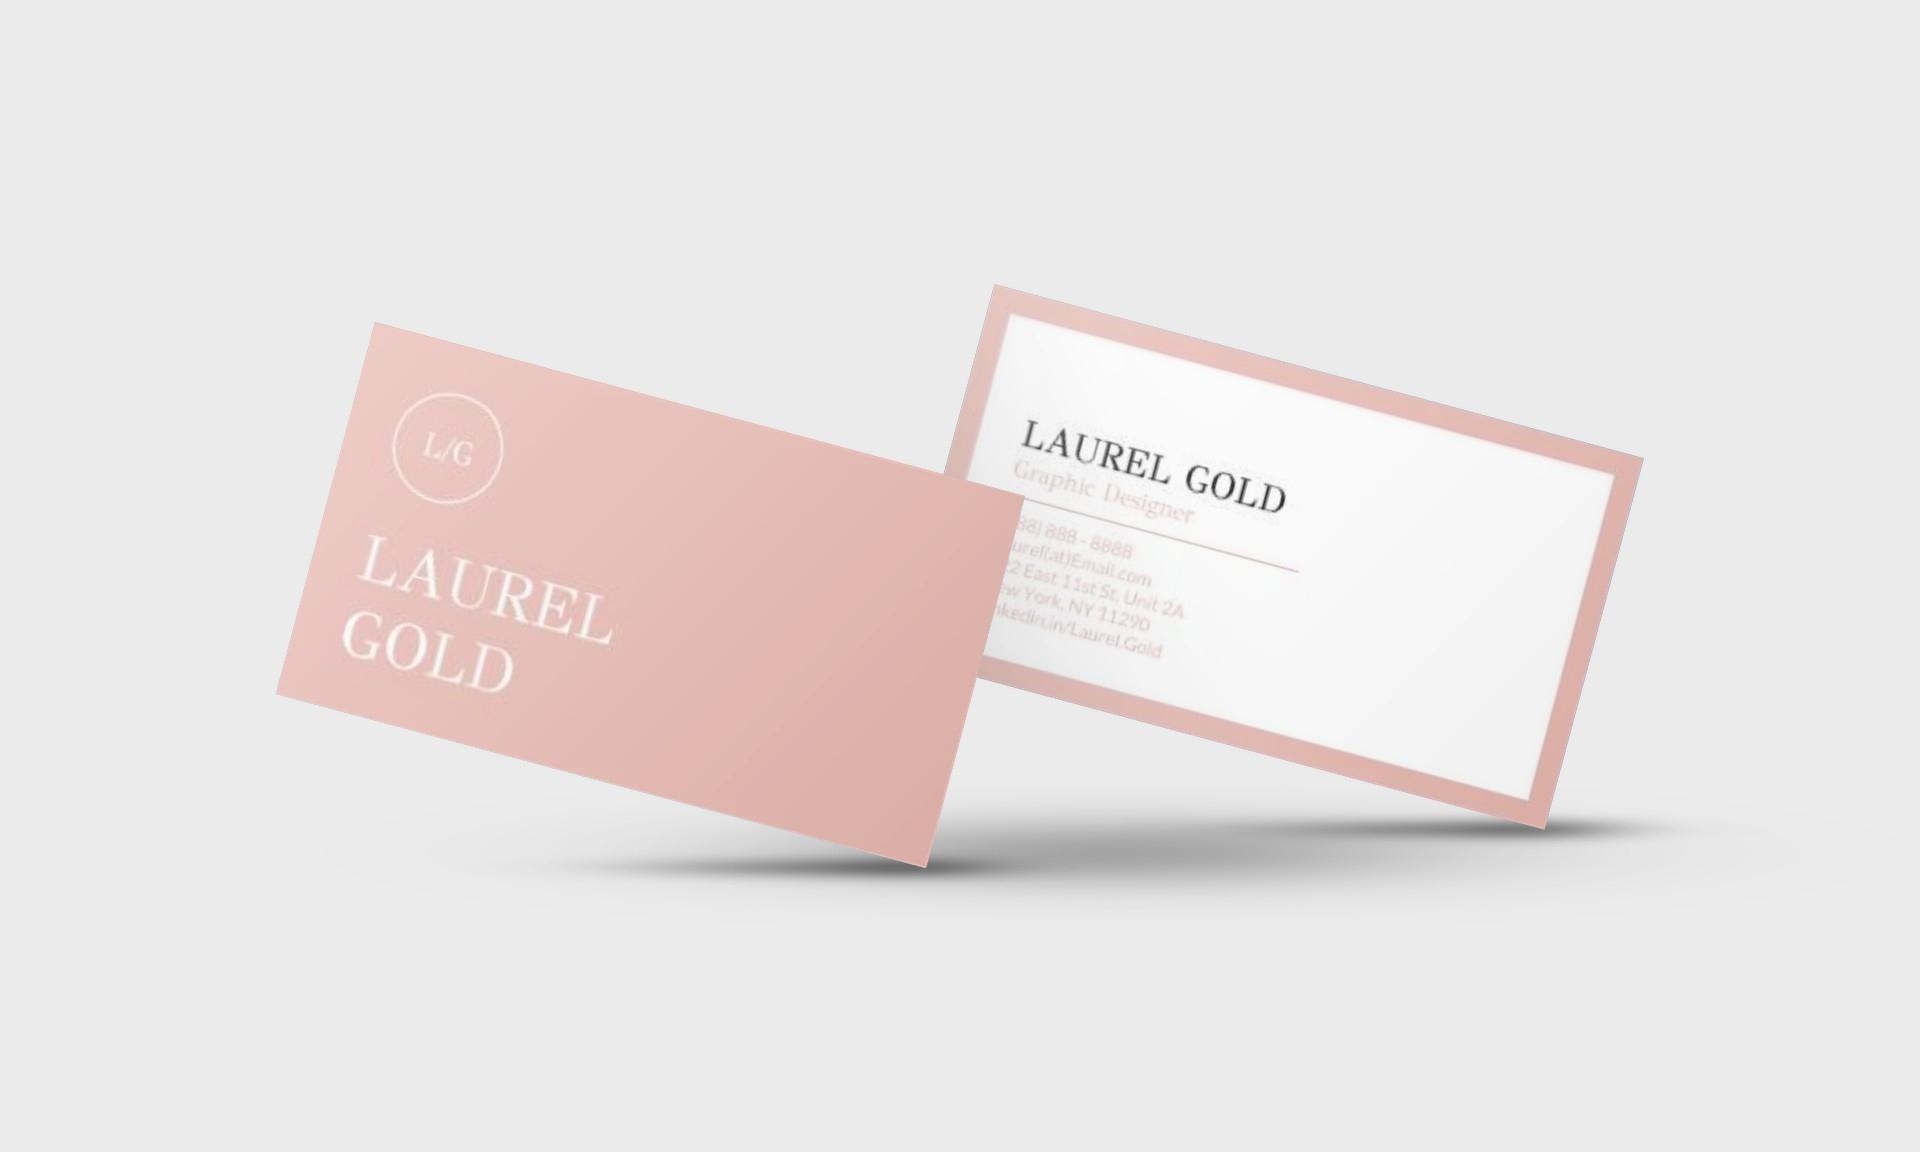 Laurel Gold Google Docs Business Card Template - Stand Out Shop Throughout Google Docs Business Card Template